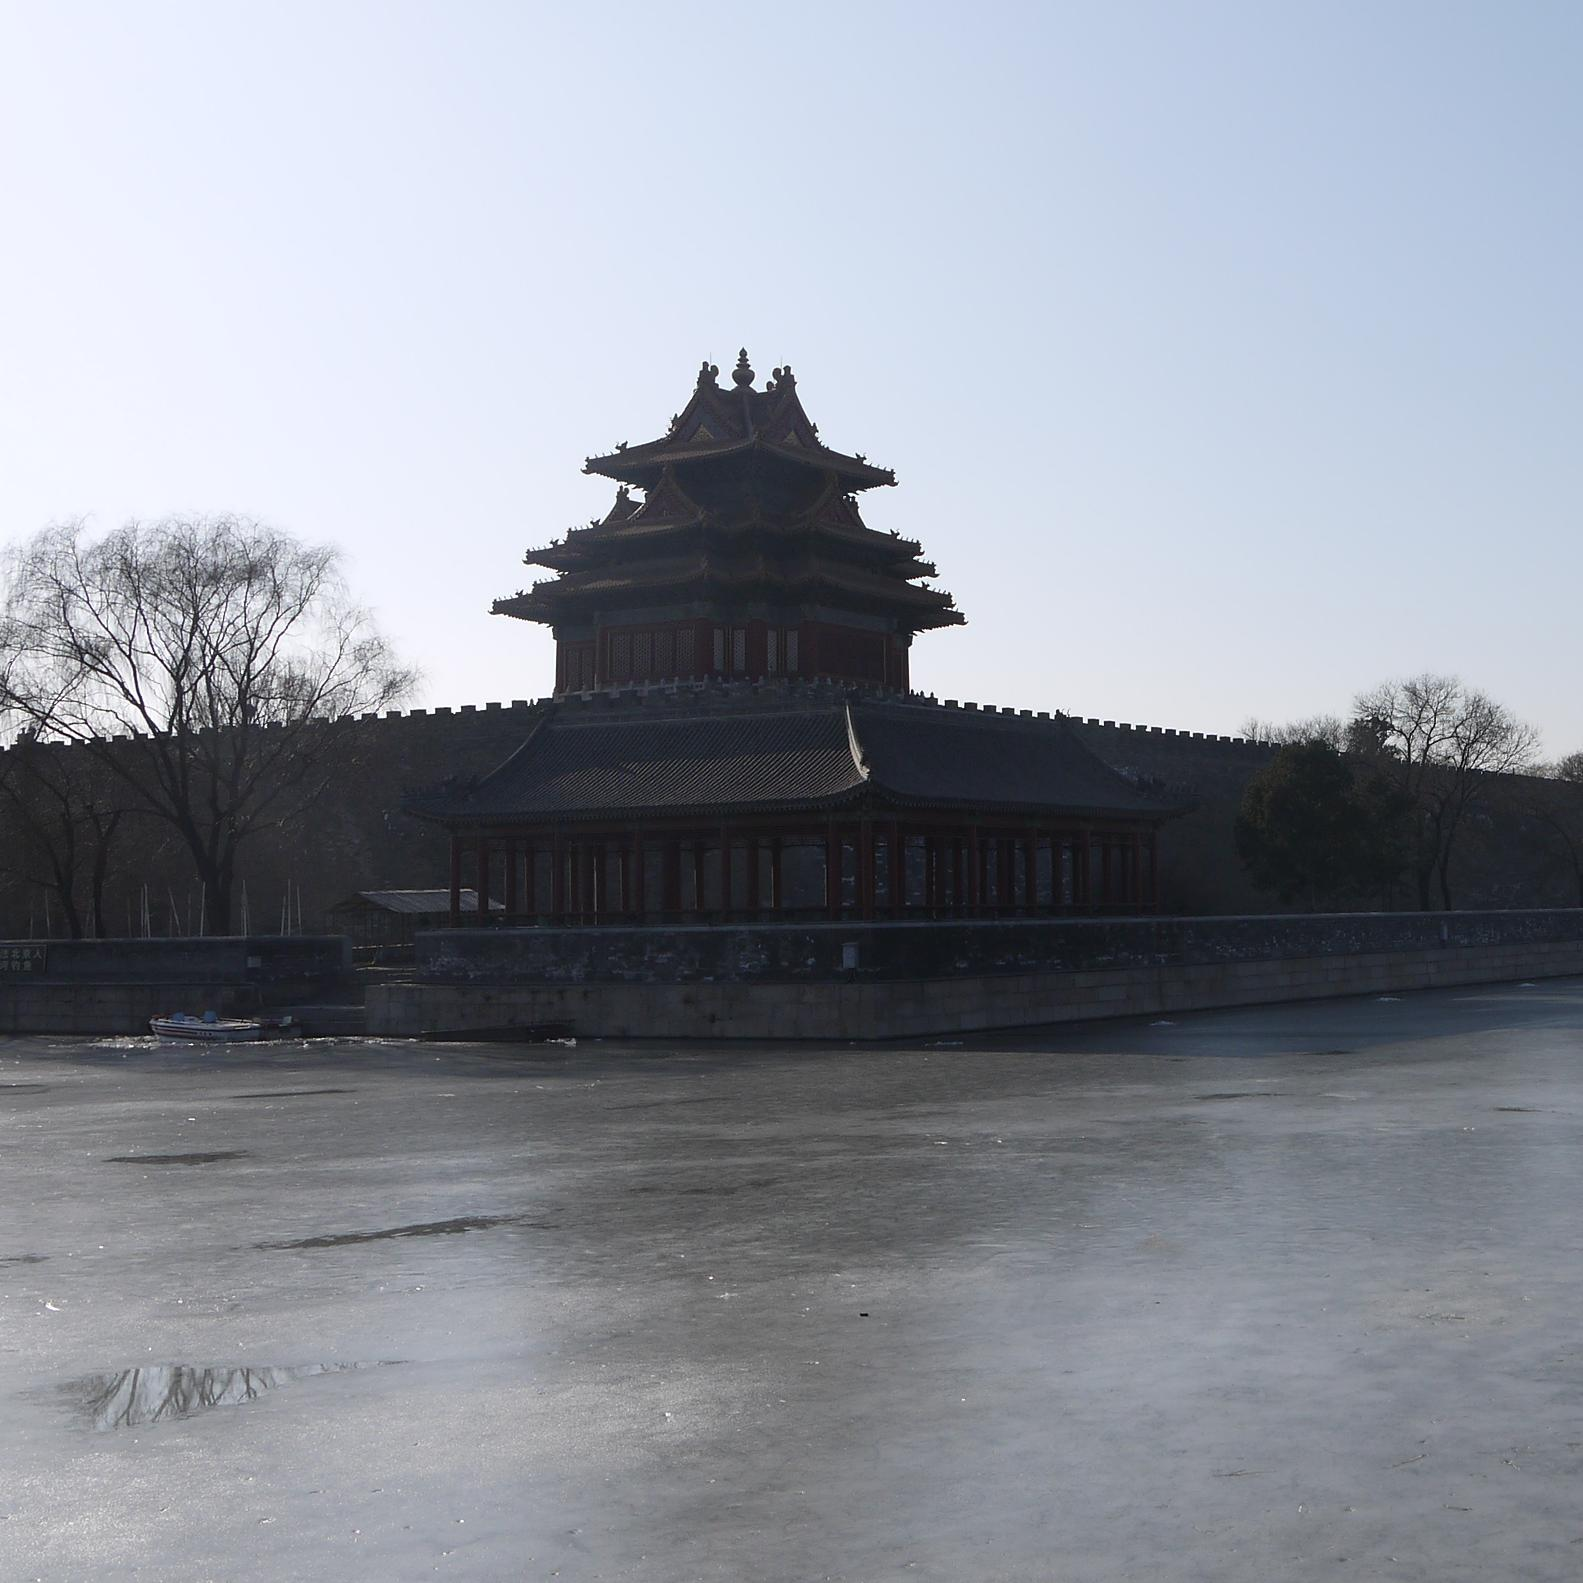 <![CDATA[北京~老北京]]>